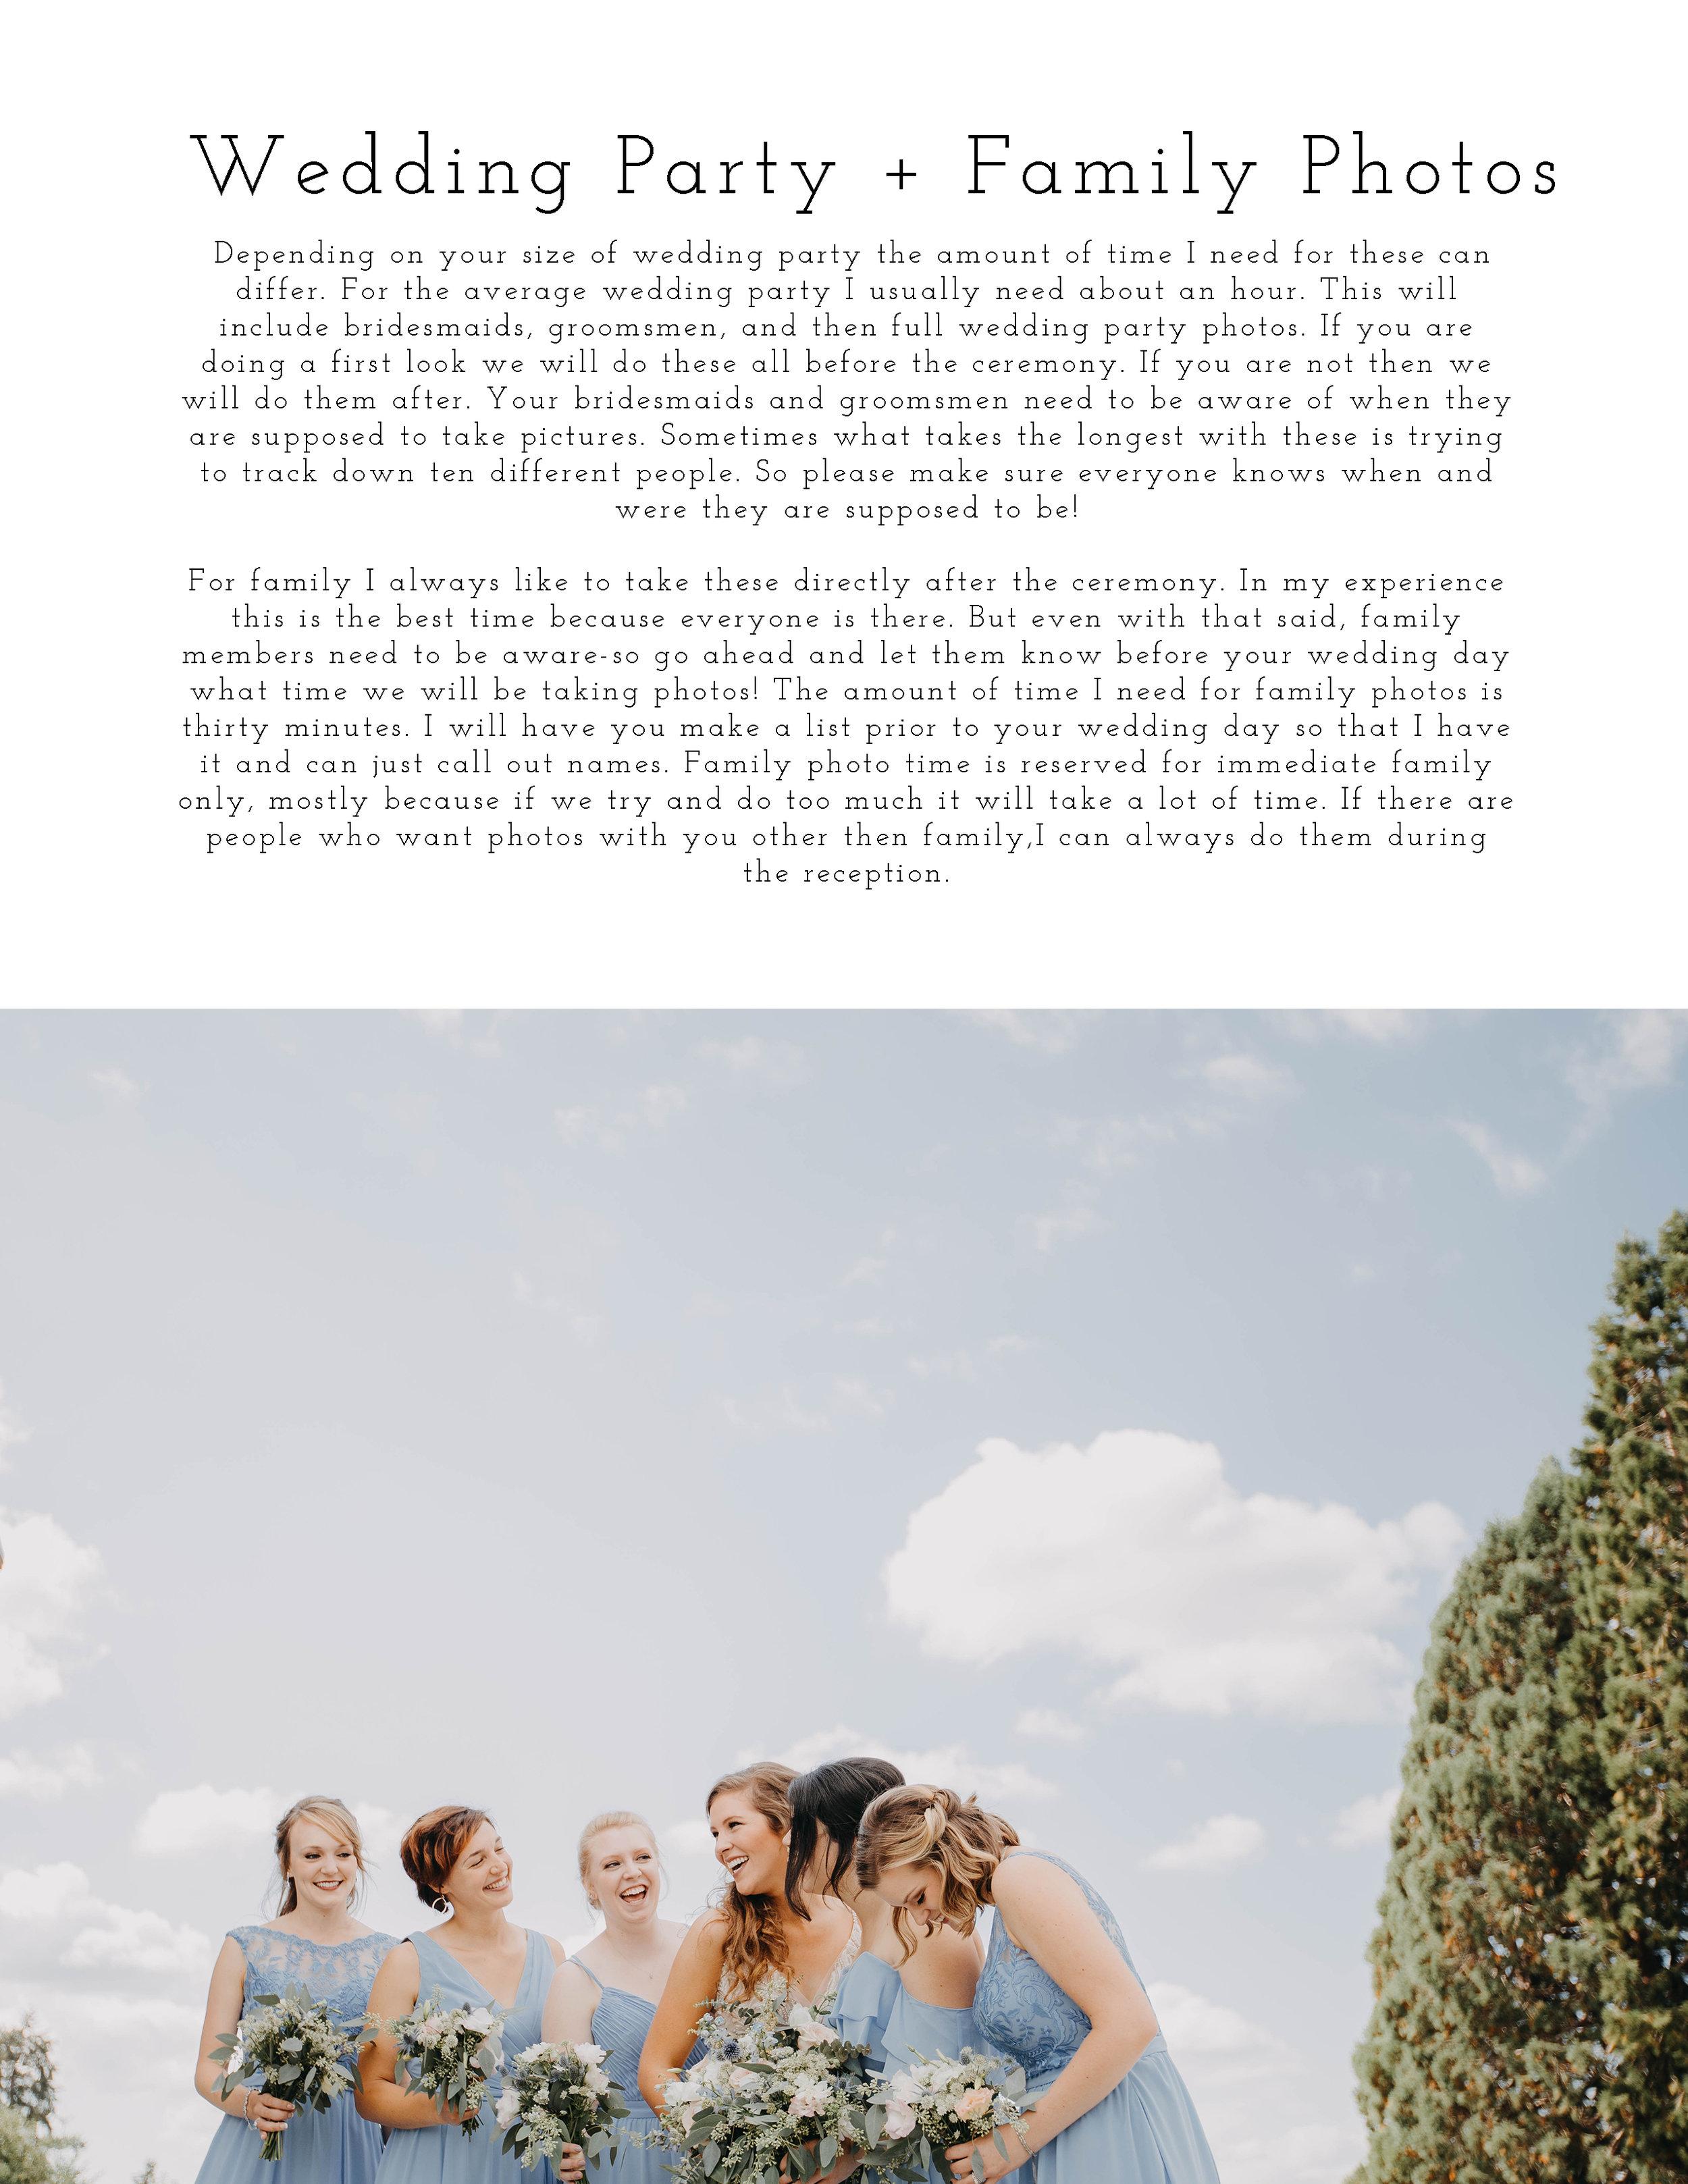 13BridalParty+Family.jpg